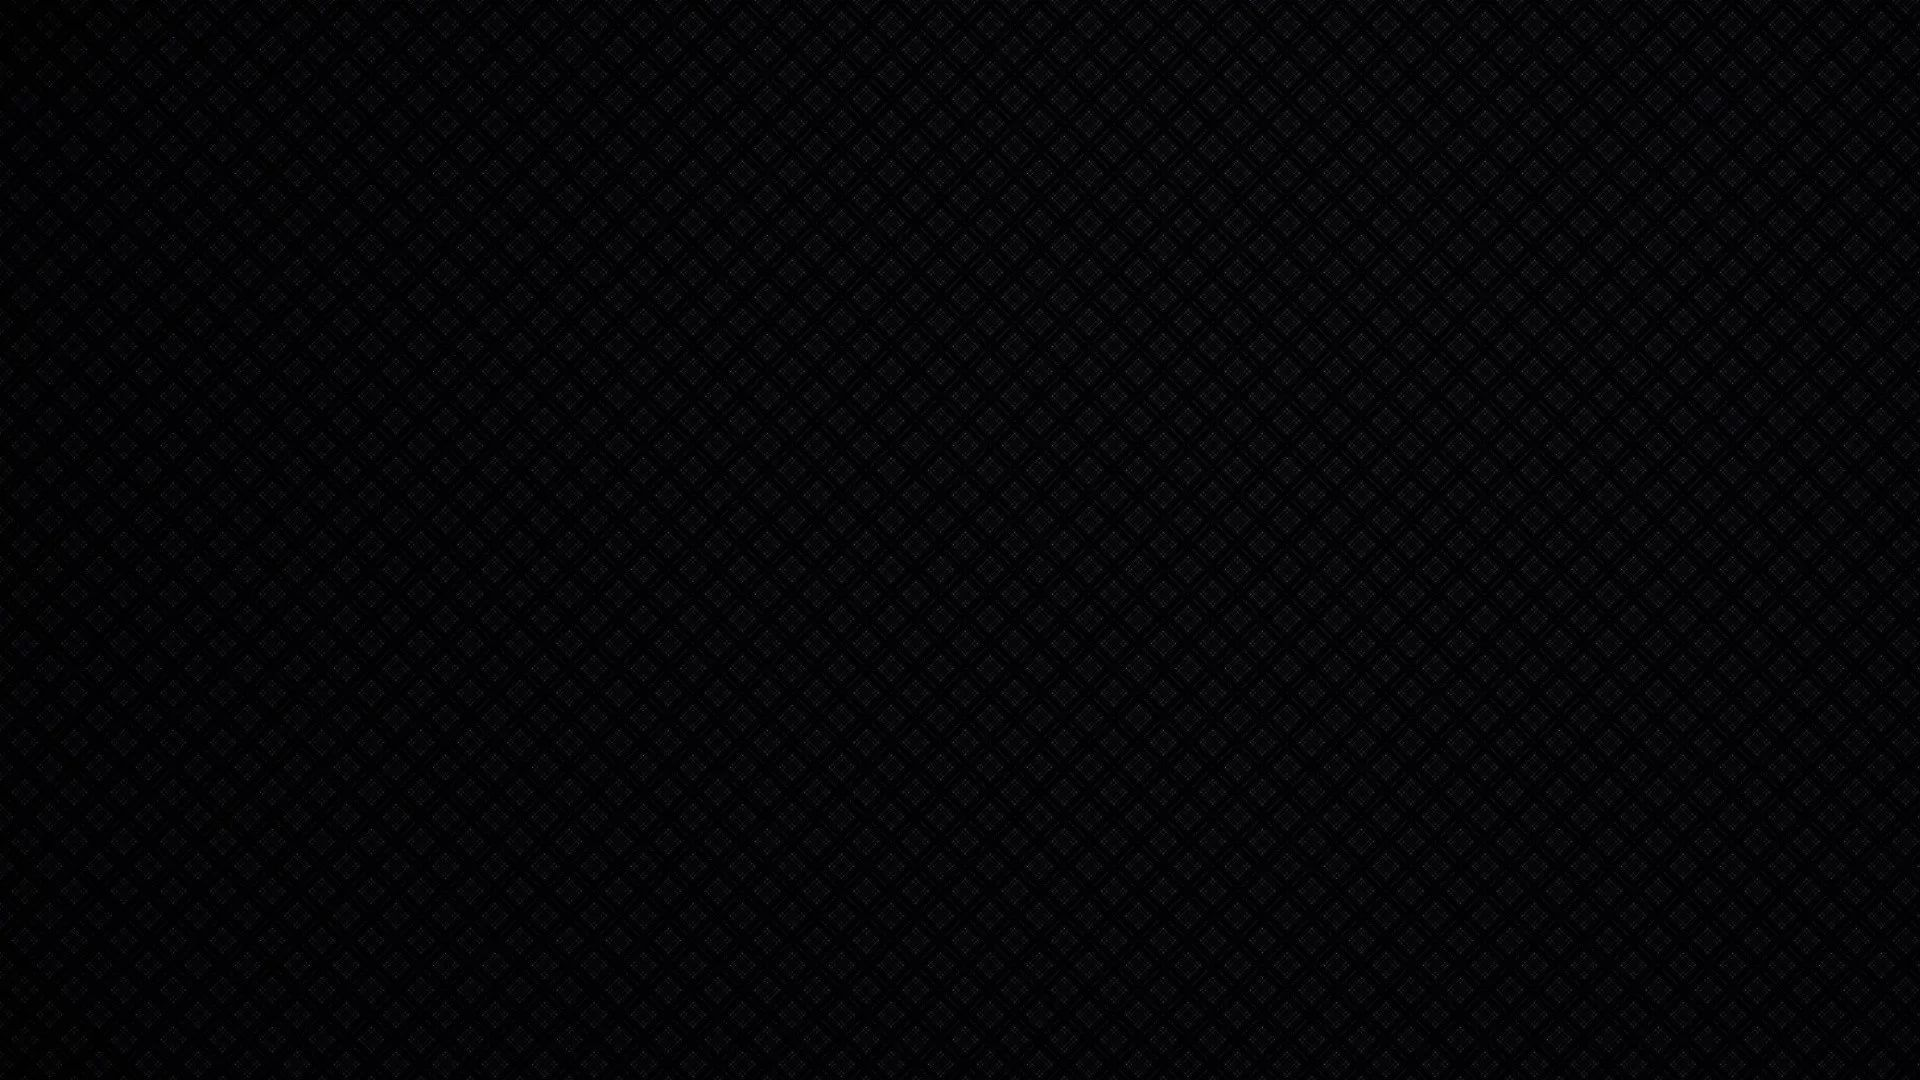 Black Screen HD Download